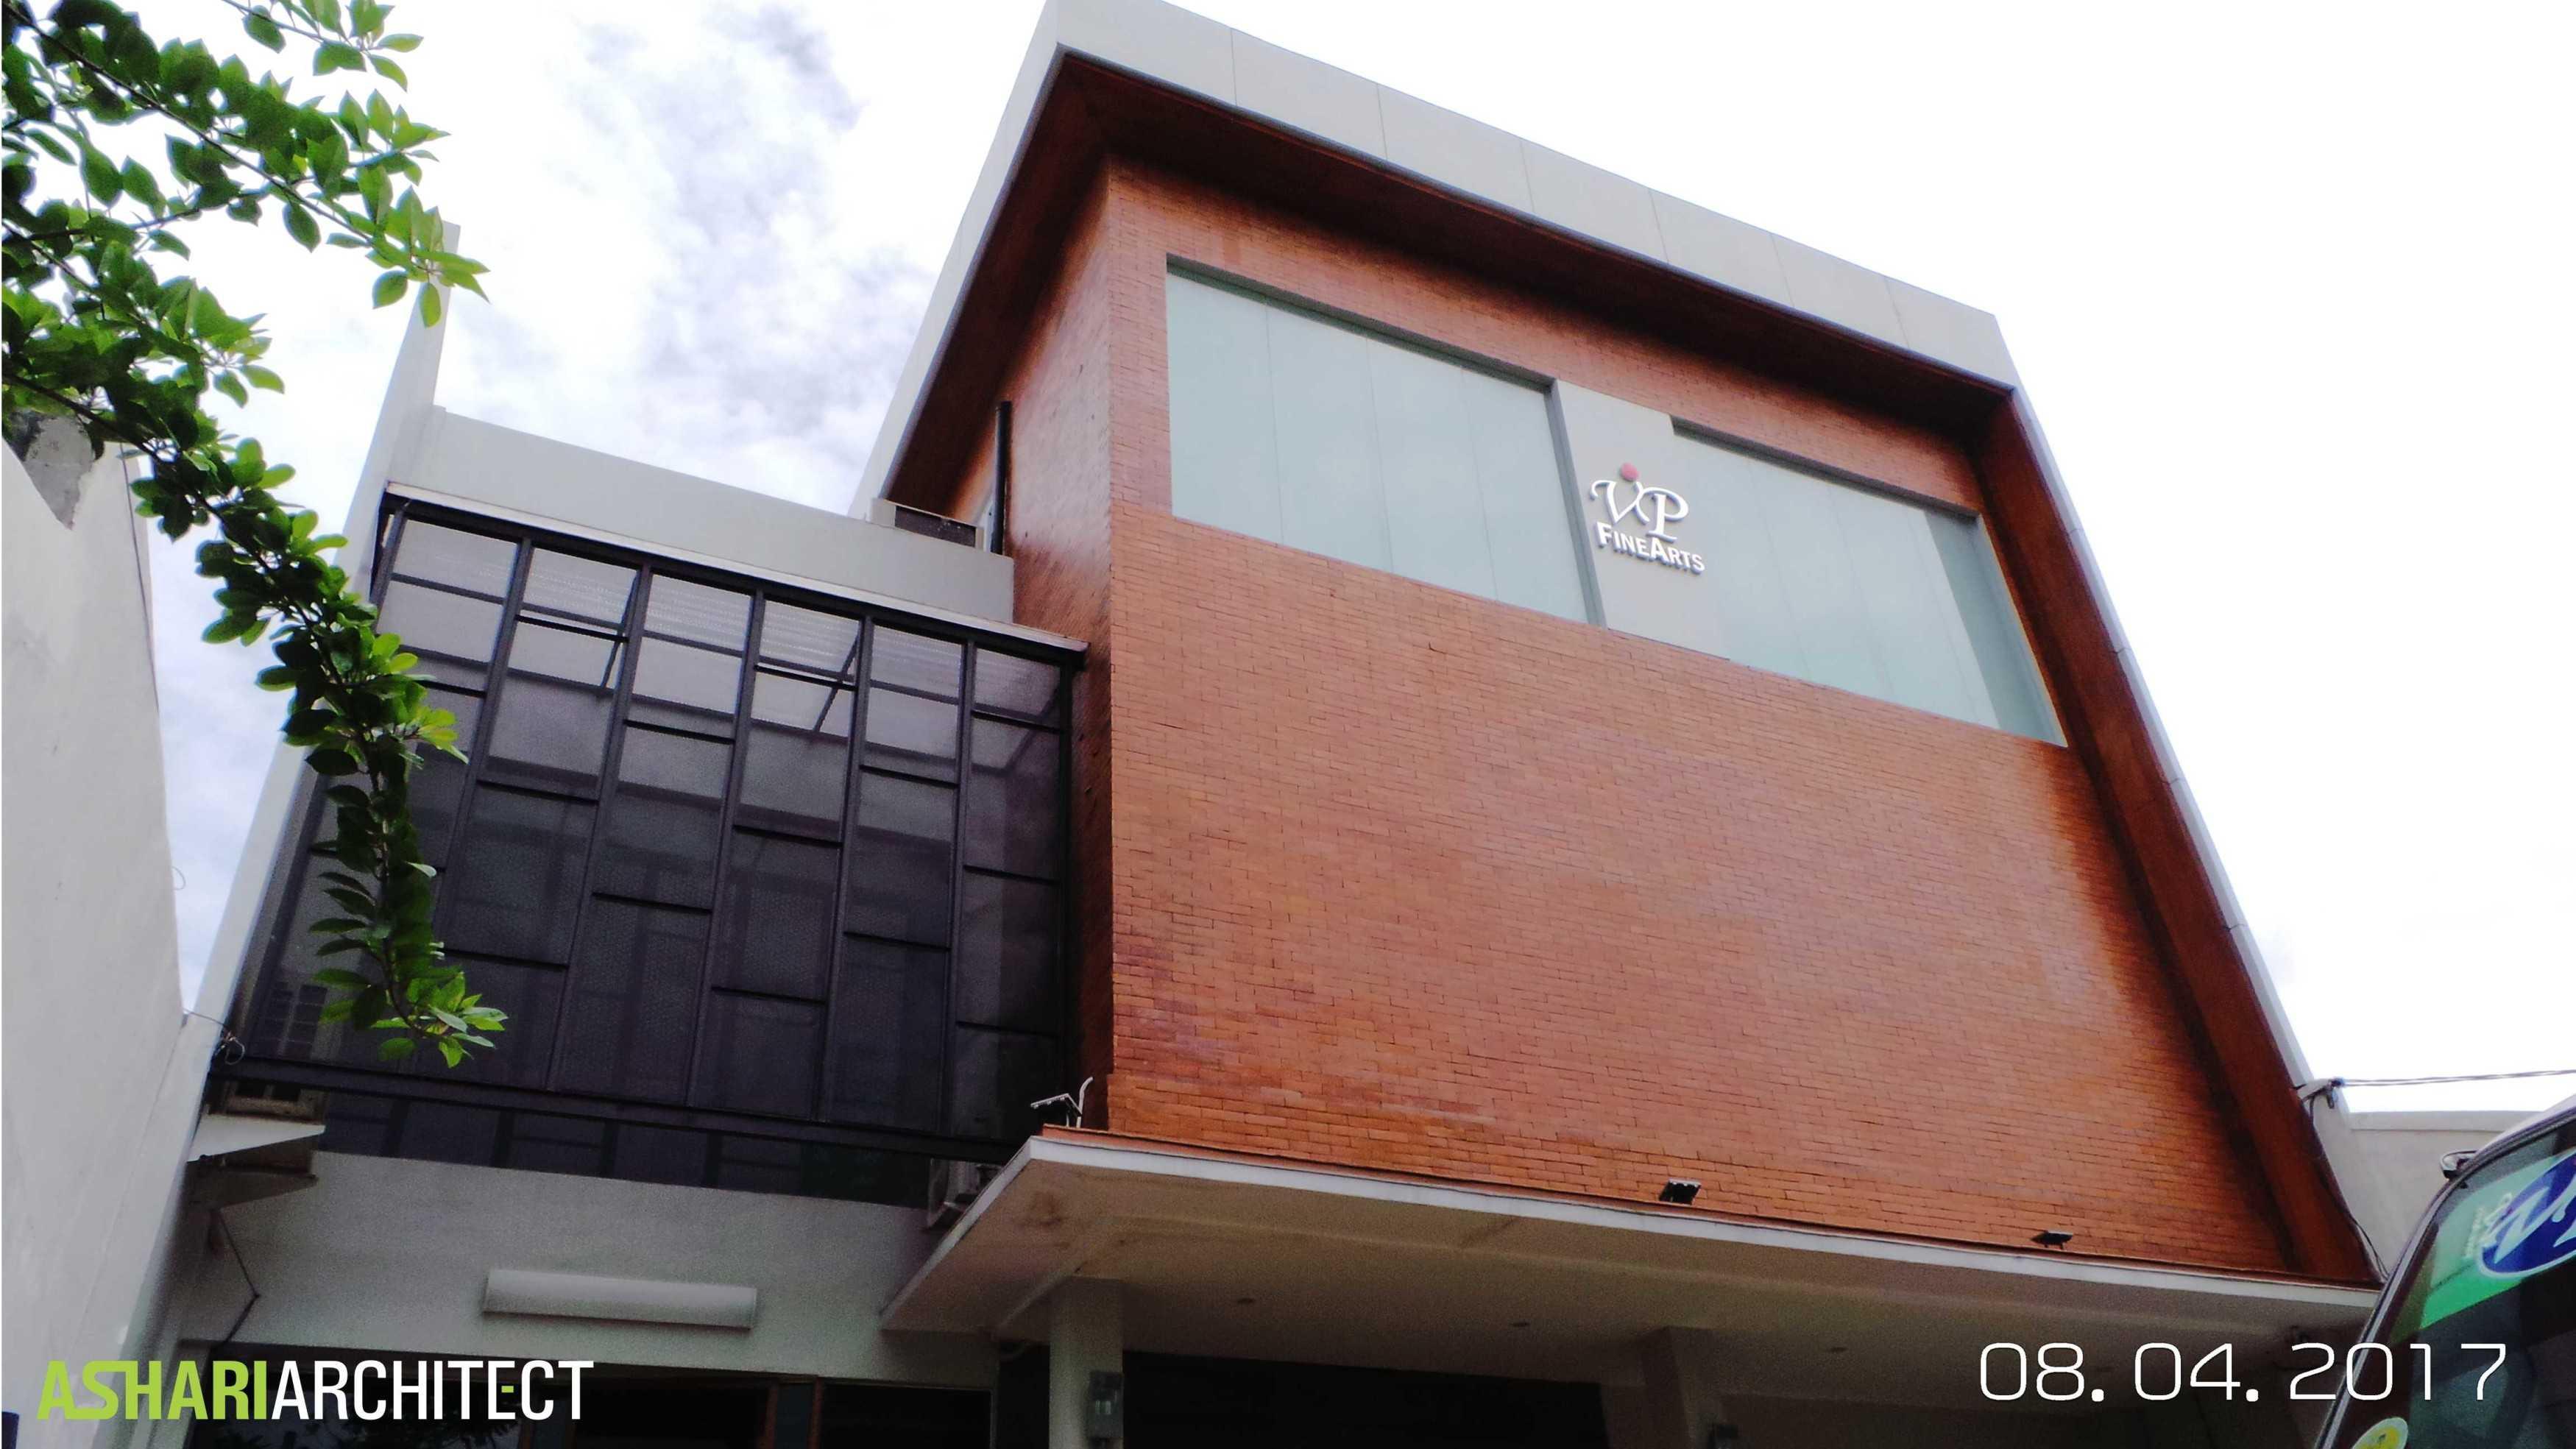 Ashari Architects Lebak Bulus Art Gallery Lebak Bulus, Cilandak, South Jakarta City, Jakarta, Indonesia Lebak Bulus, Cilandak, South Jakarta City, Jakarta, Indonesia 07   30617